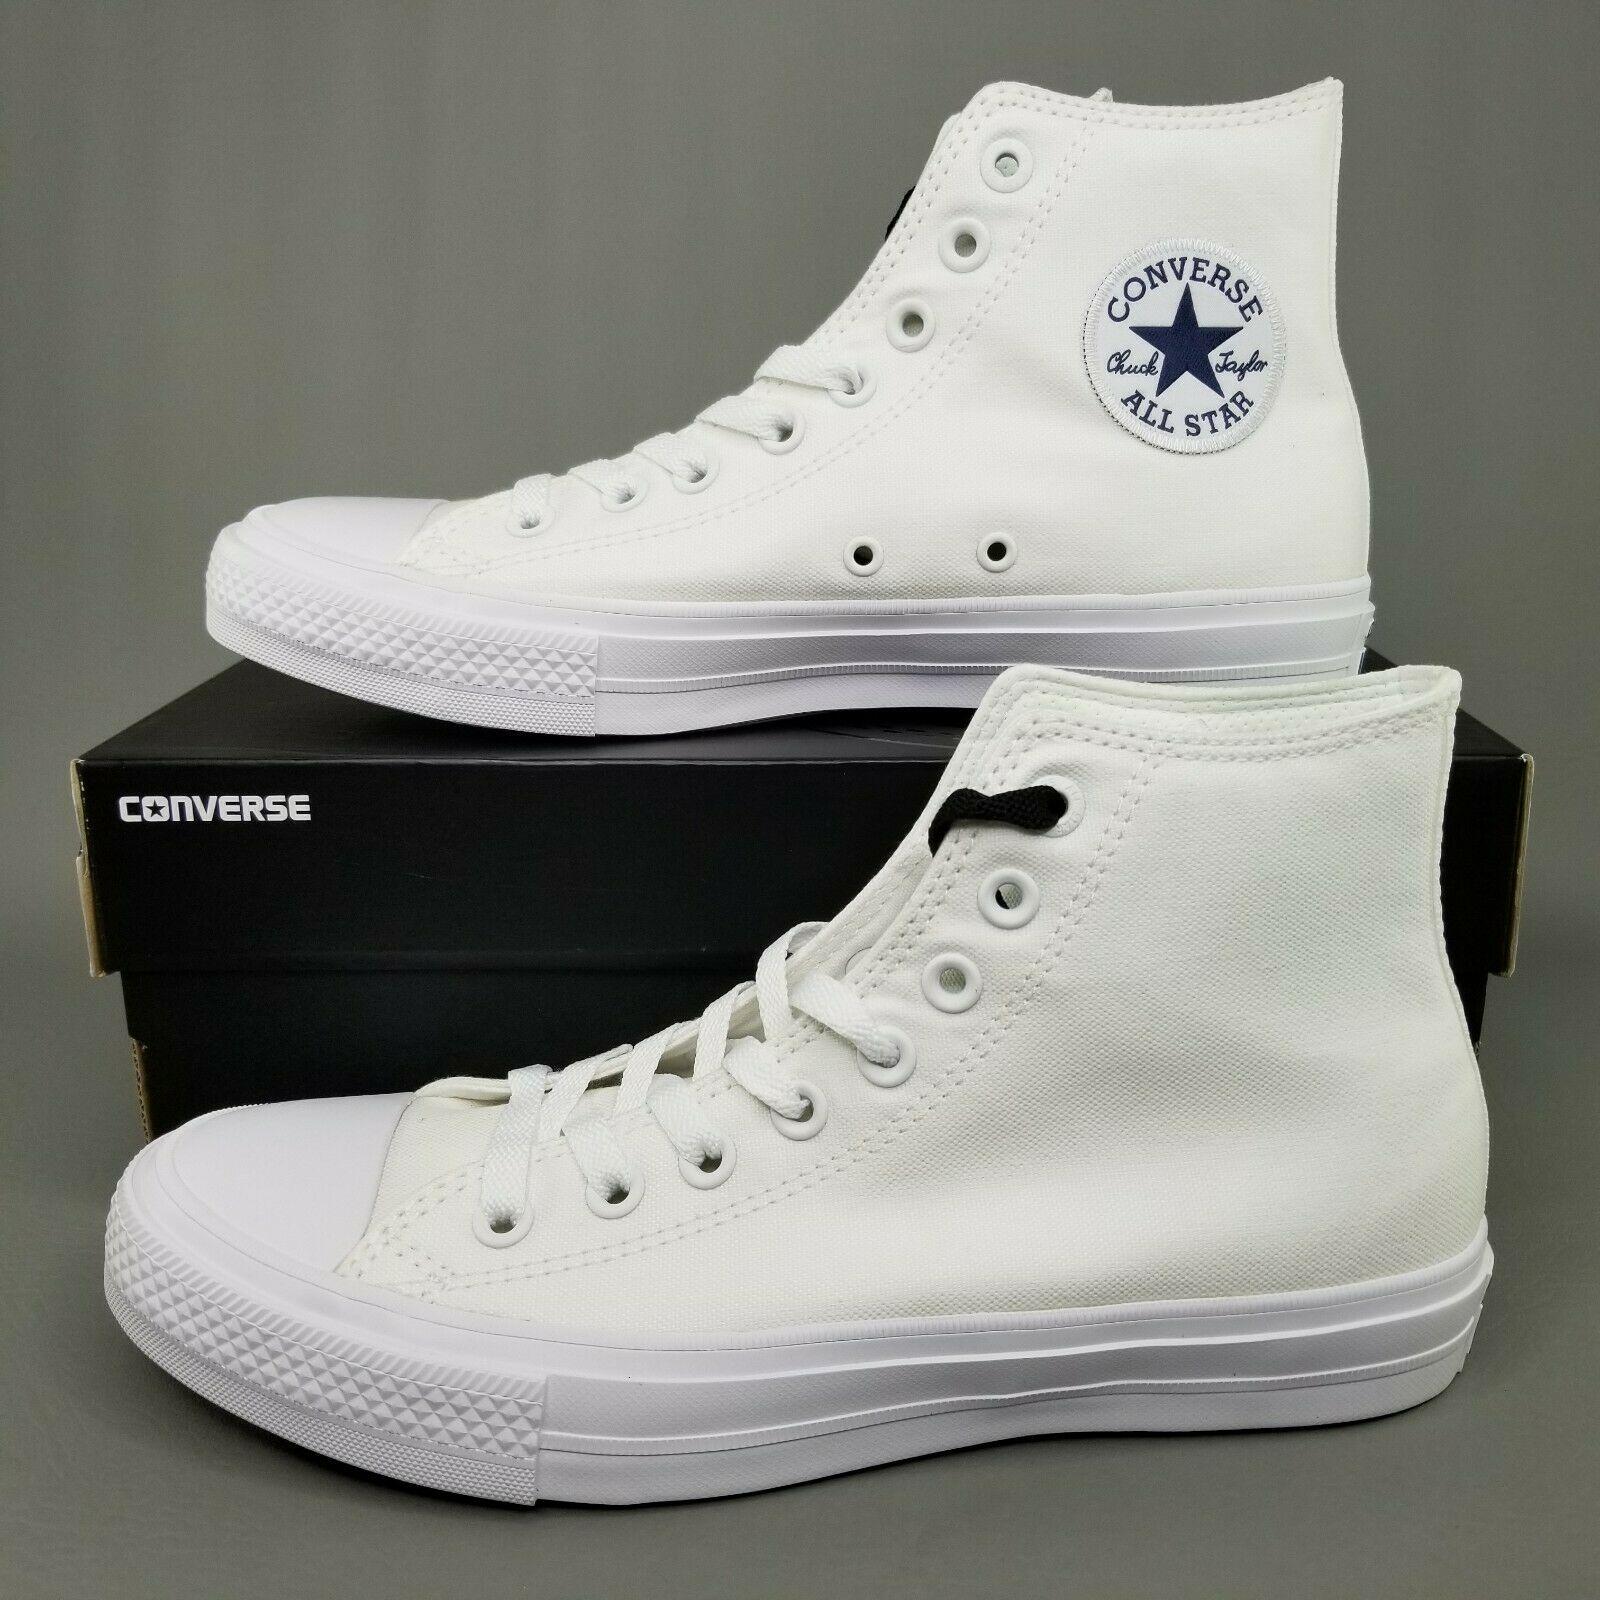 Converse Chuck Taylor II 2 Hi White